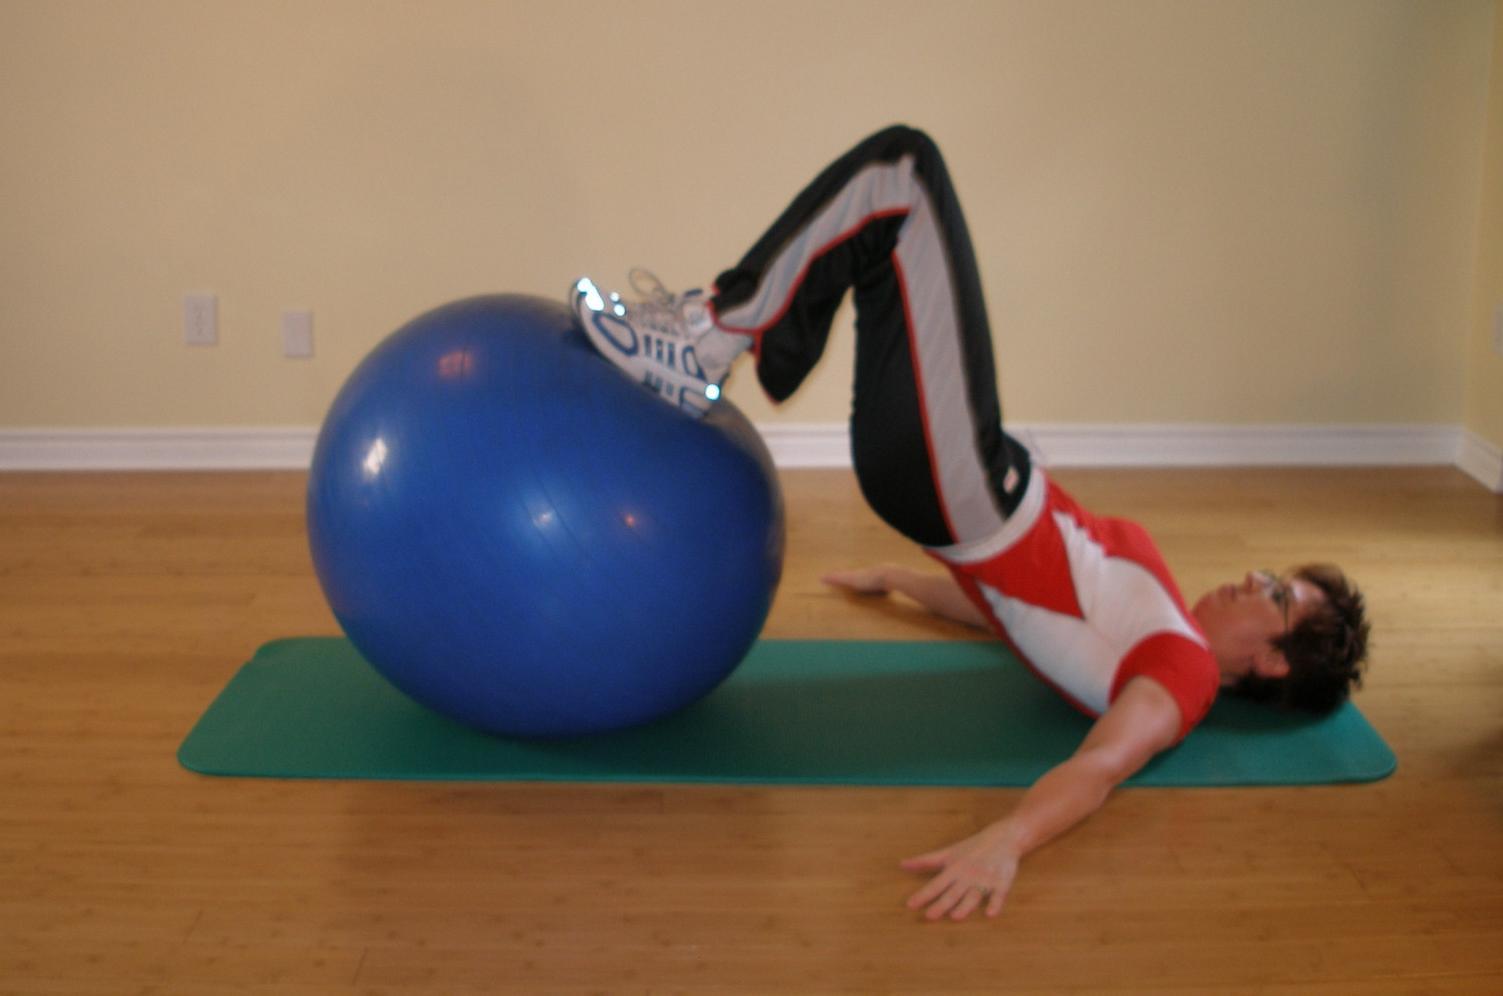 exercise ball exercise for scuba diving